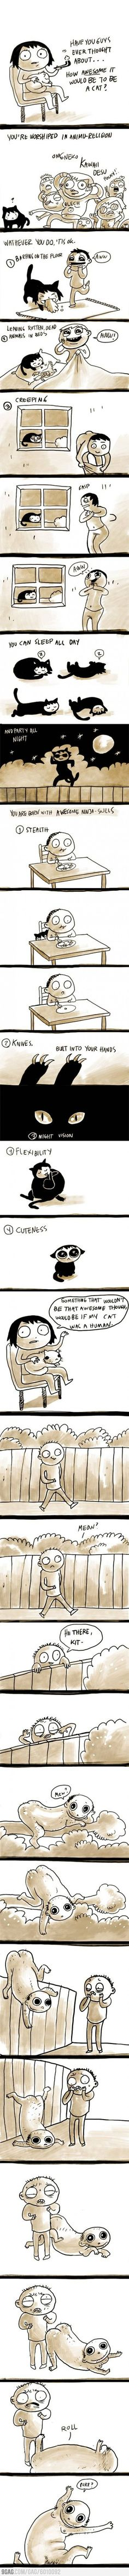 cats, funni stuff, laugh, giggl, hilari, random, humor, awesom, thing